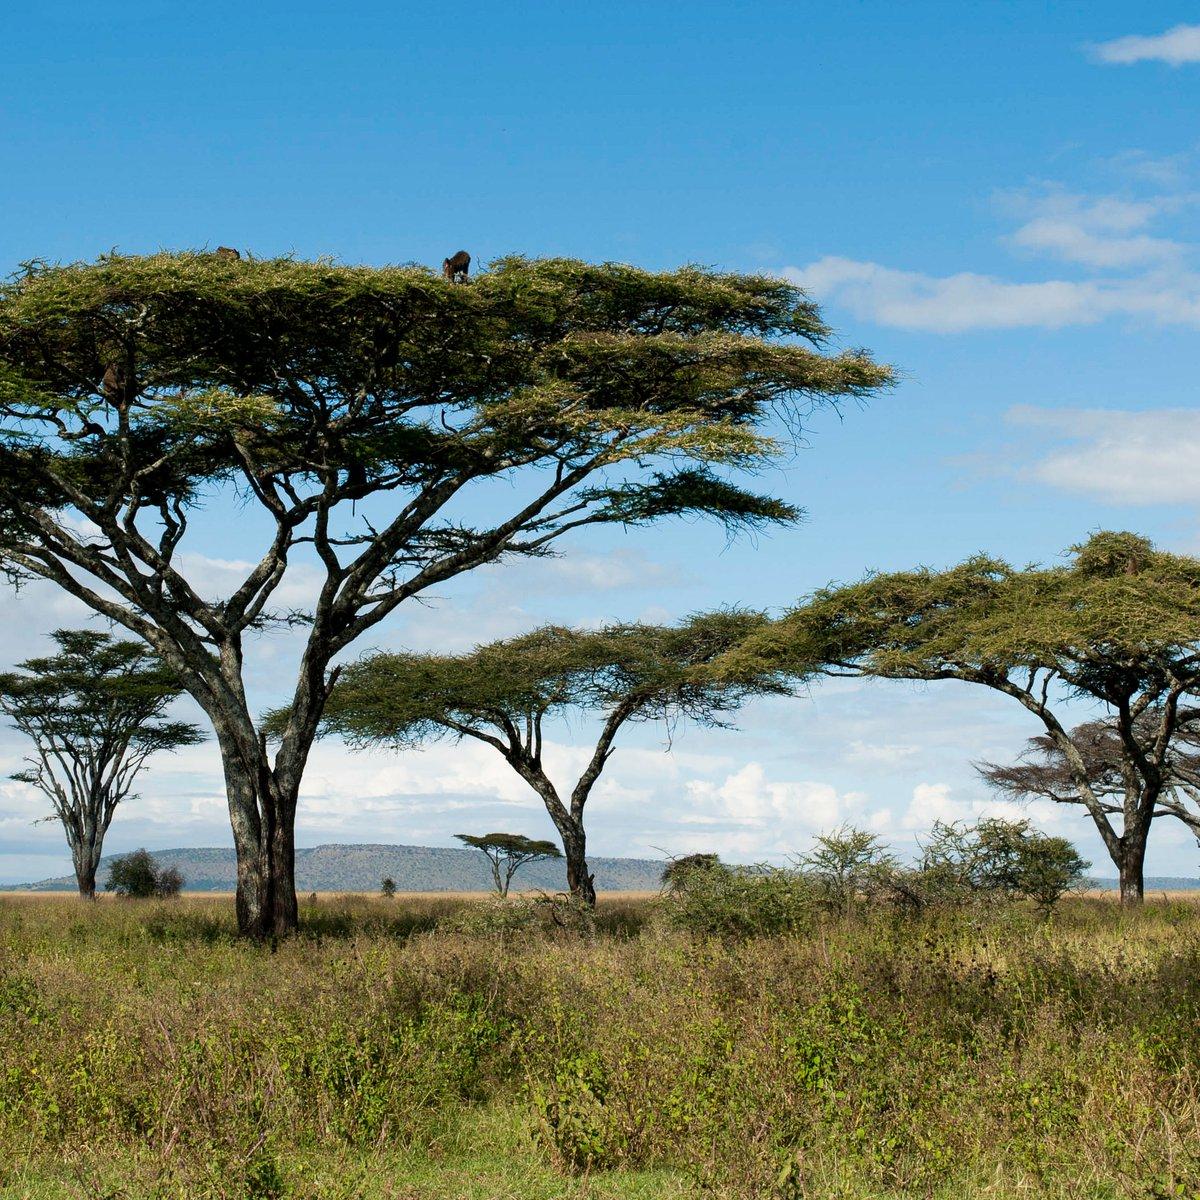 Tanzania Service Expedition